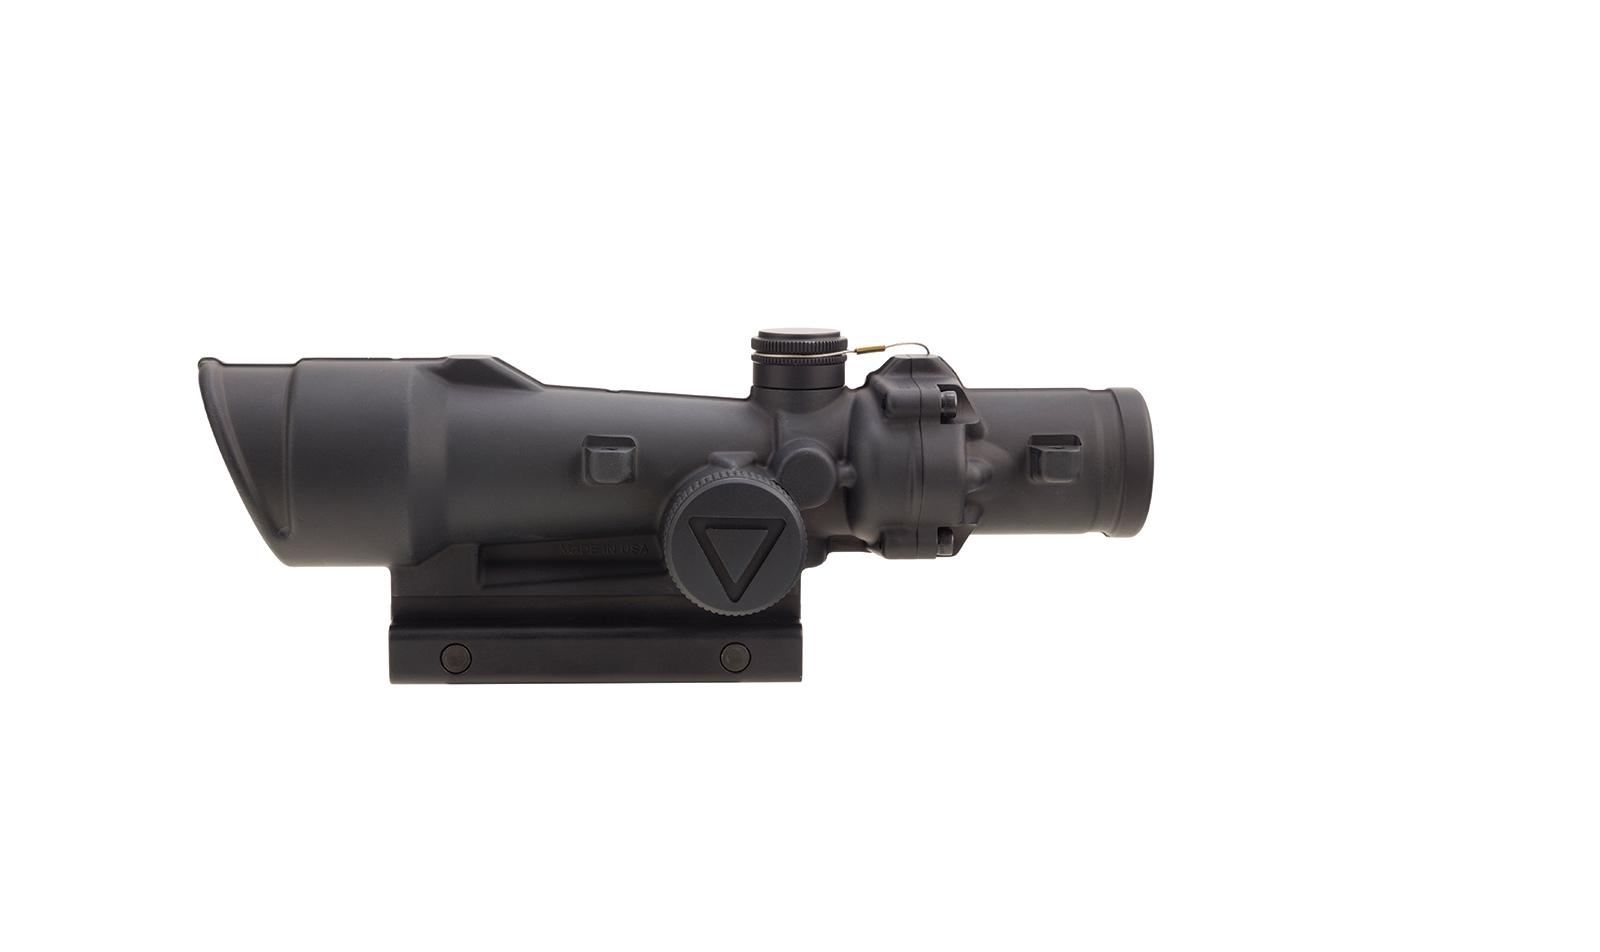 TA110-D-100501 angle 2